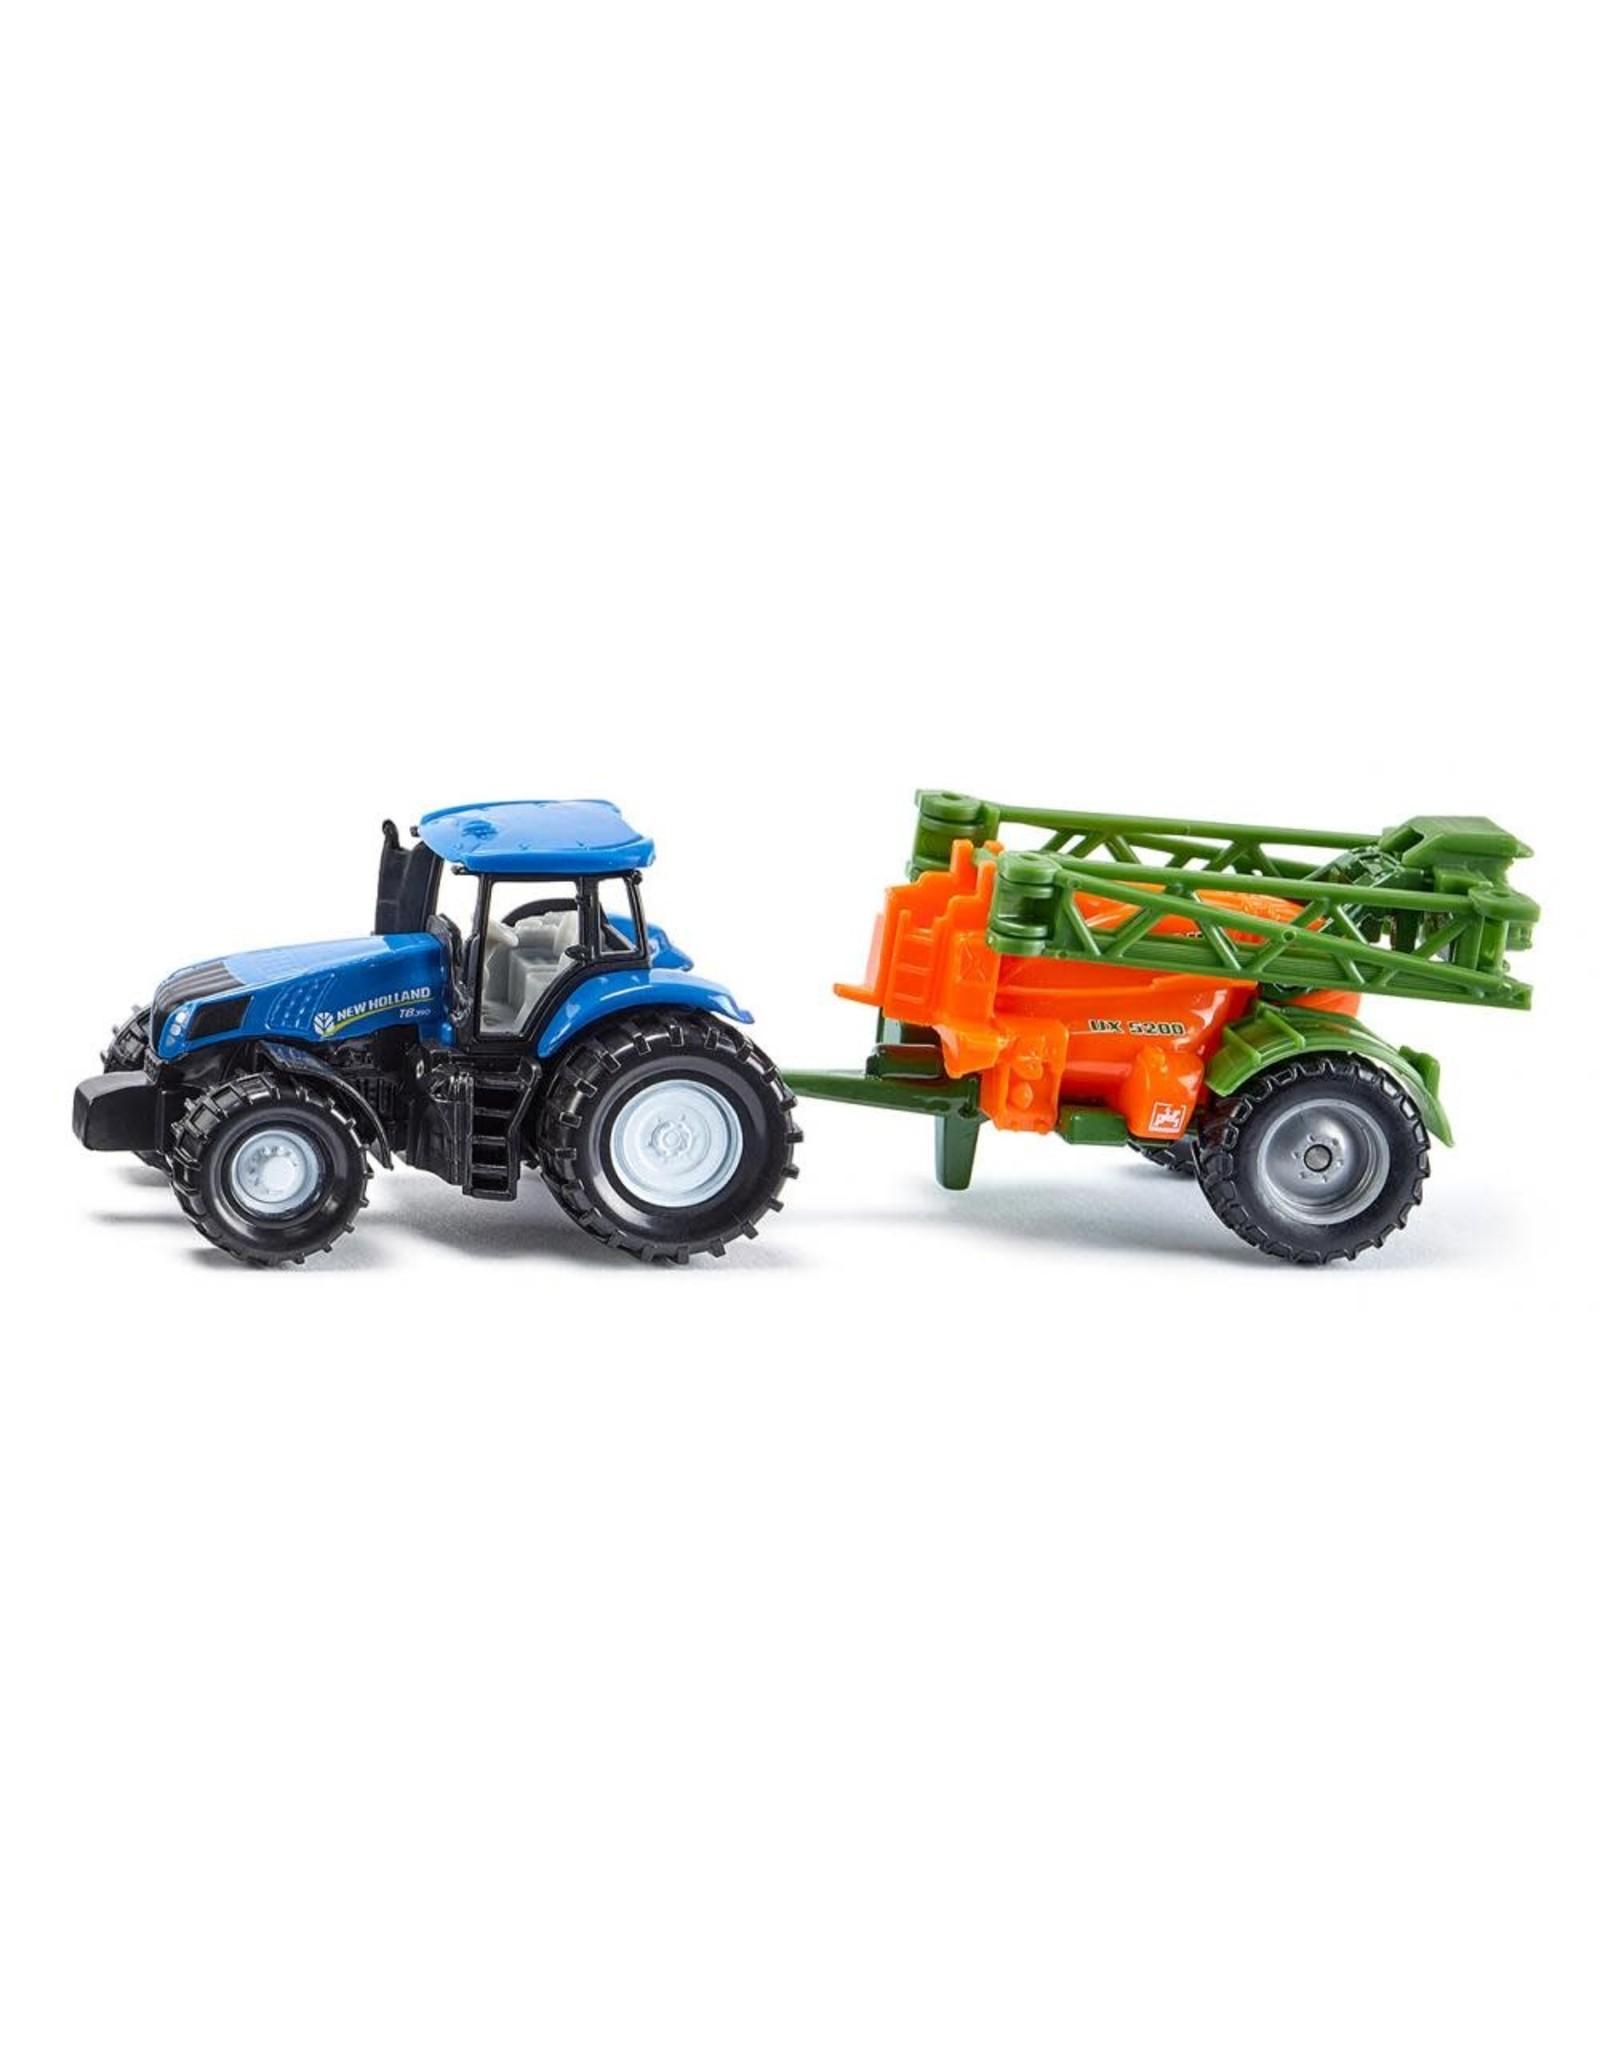 Siku Siku New Holland Tractor with Crop Sprayer